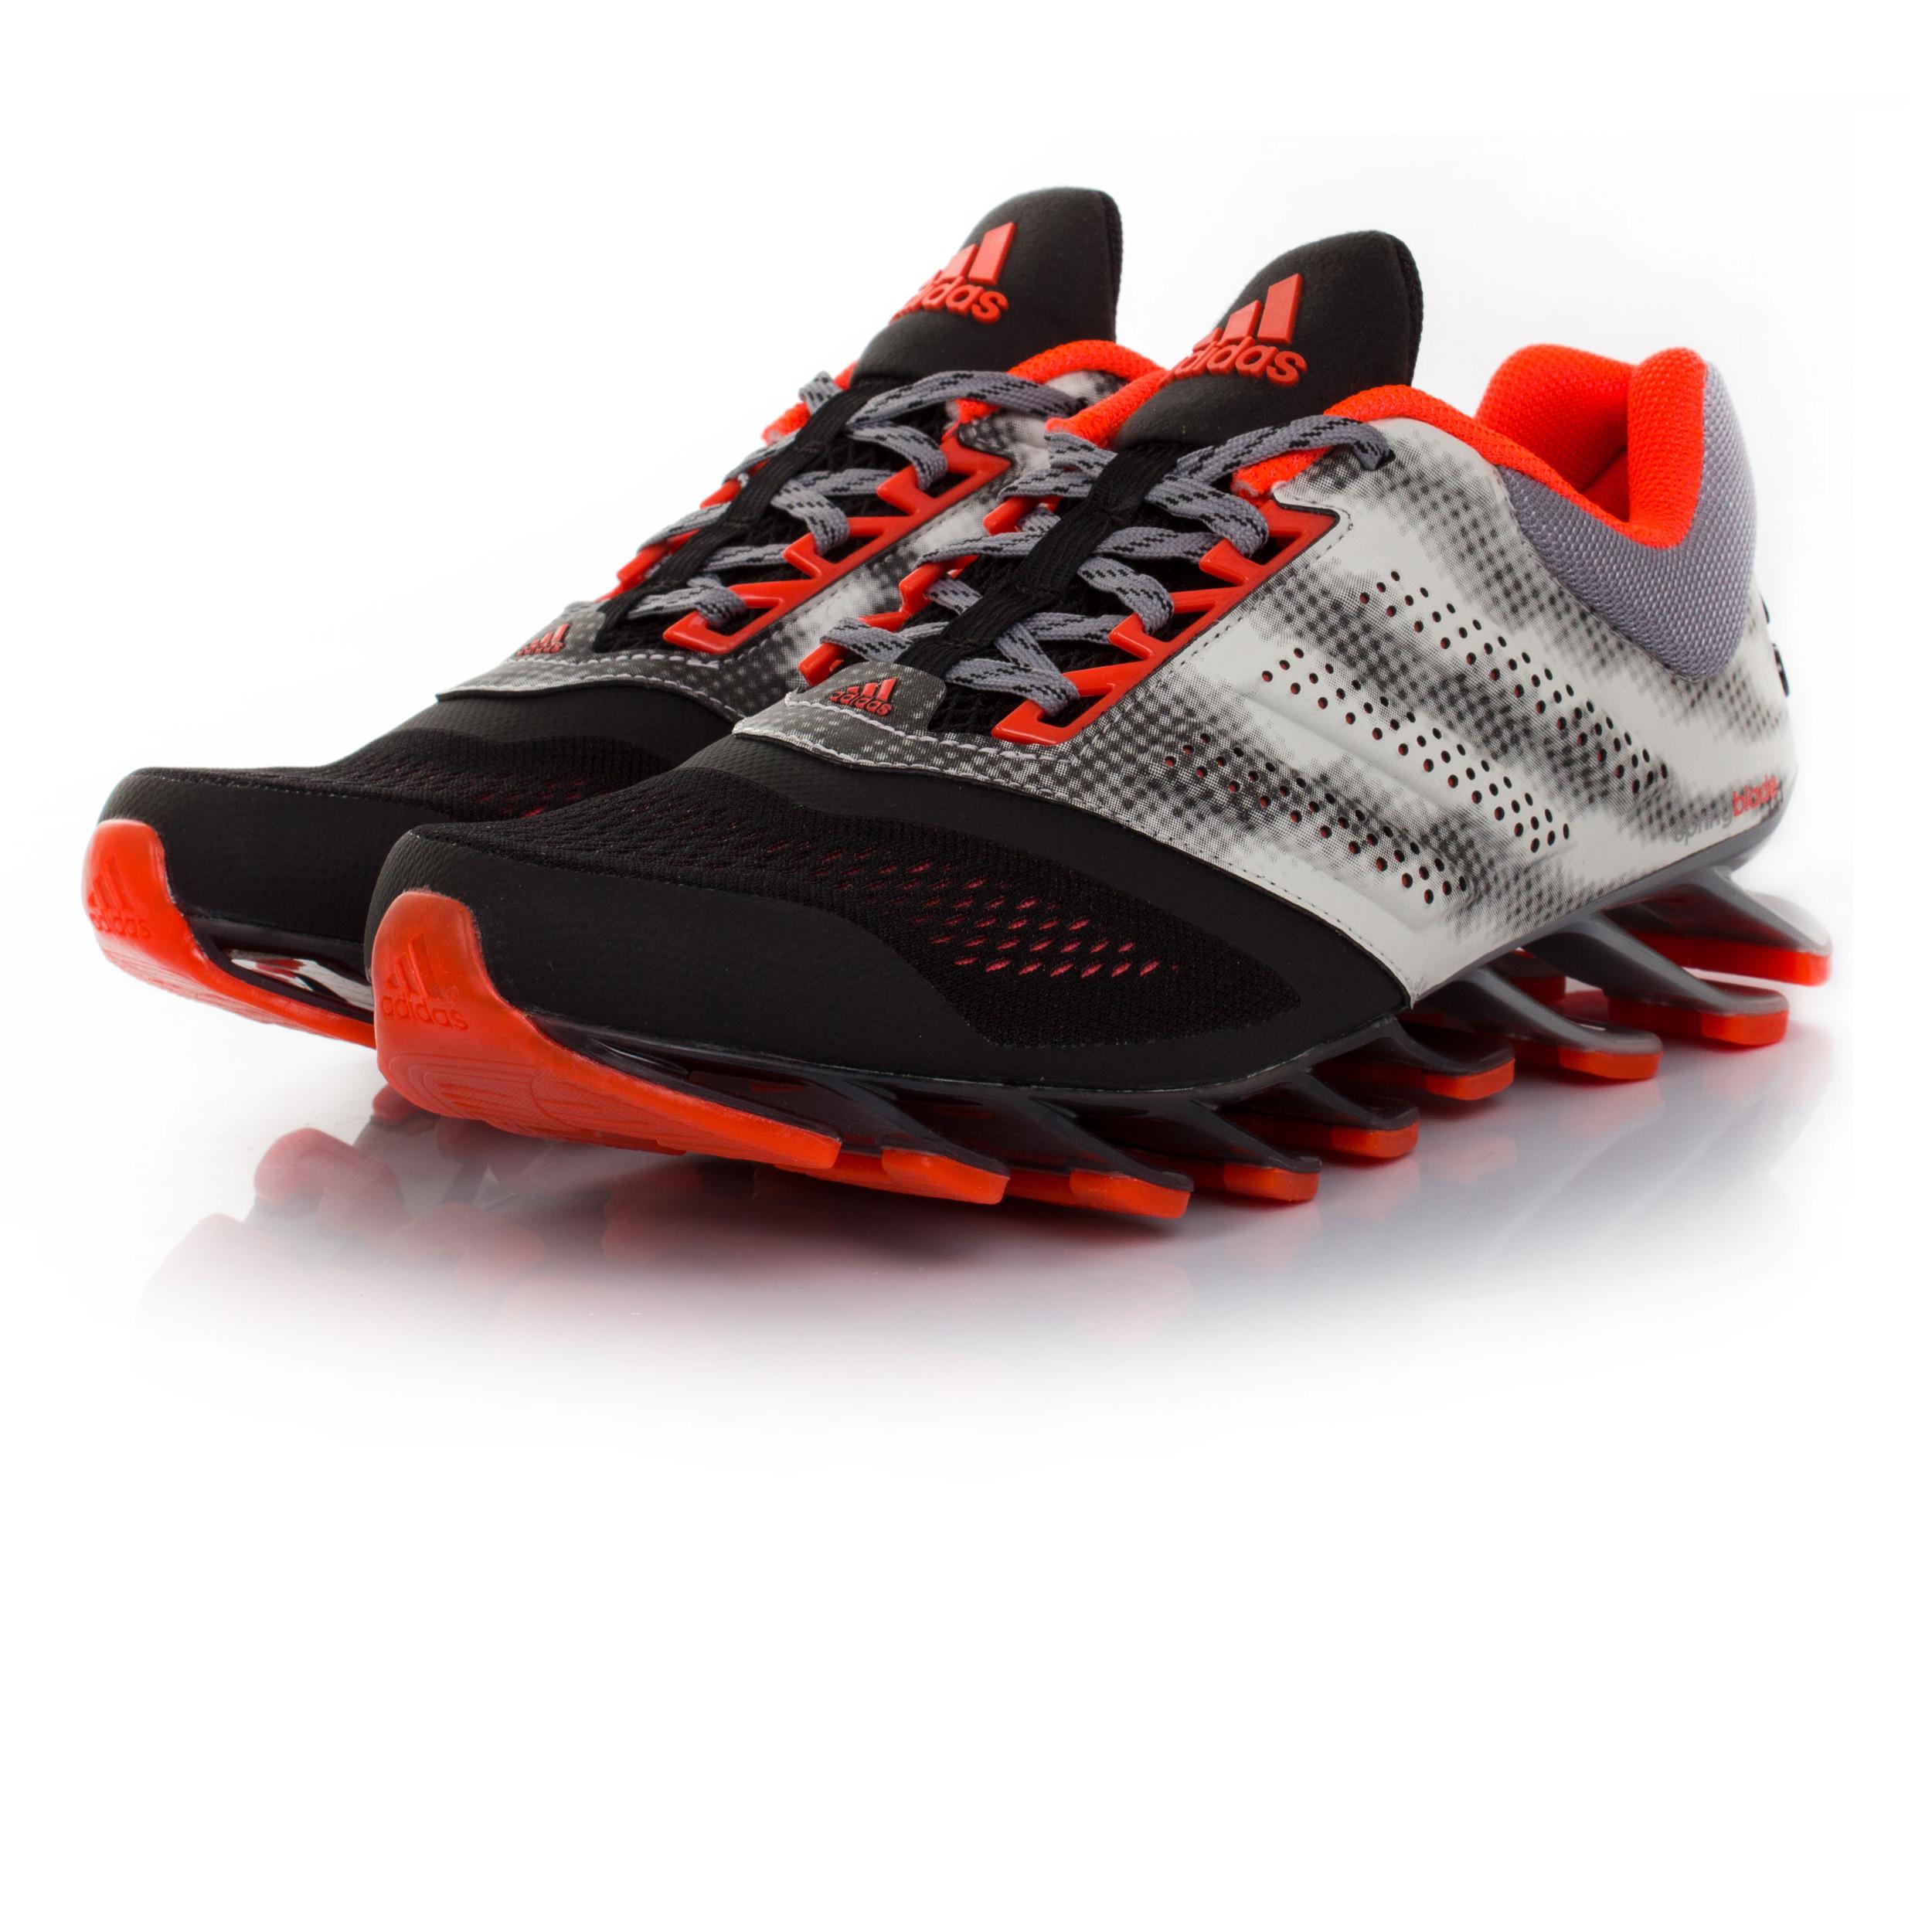 Product mix of adidas sports company